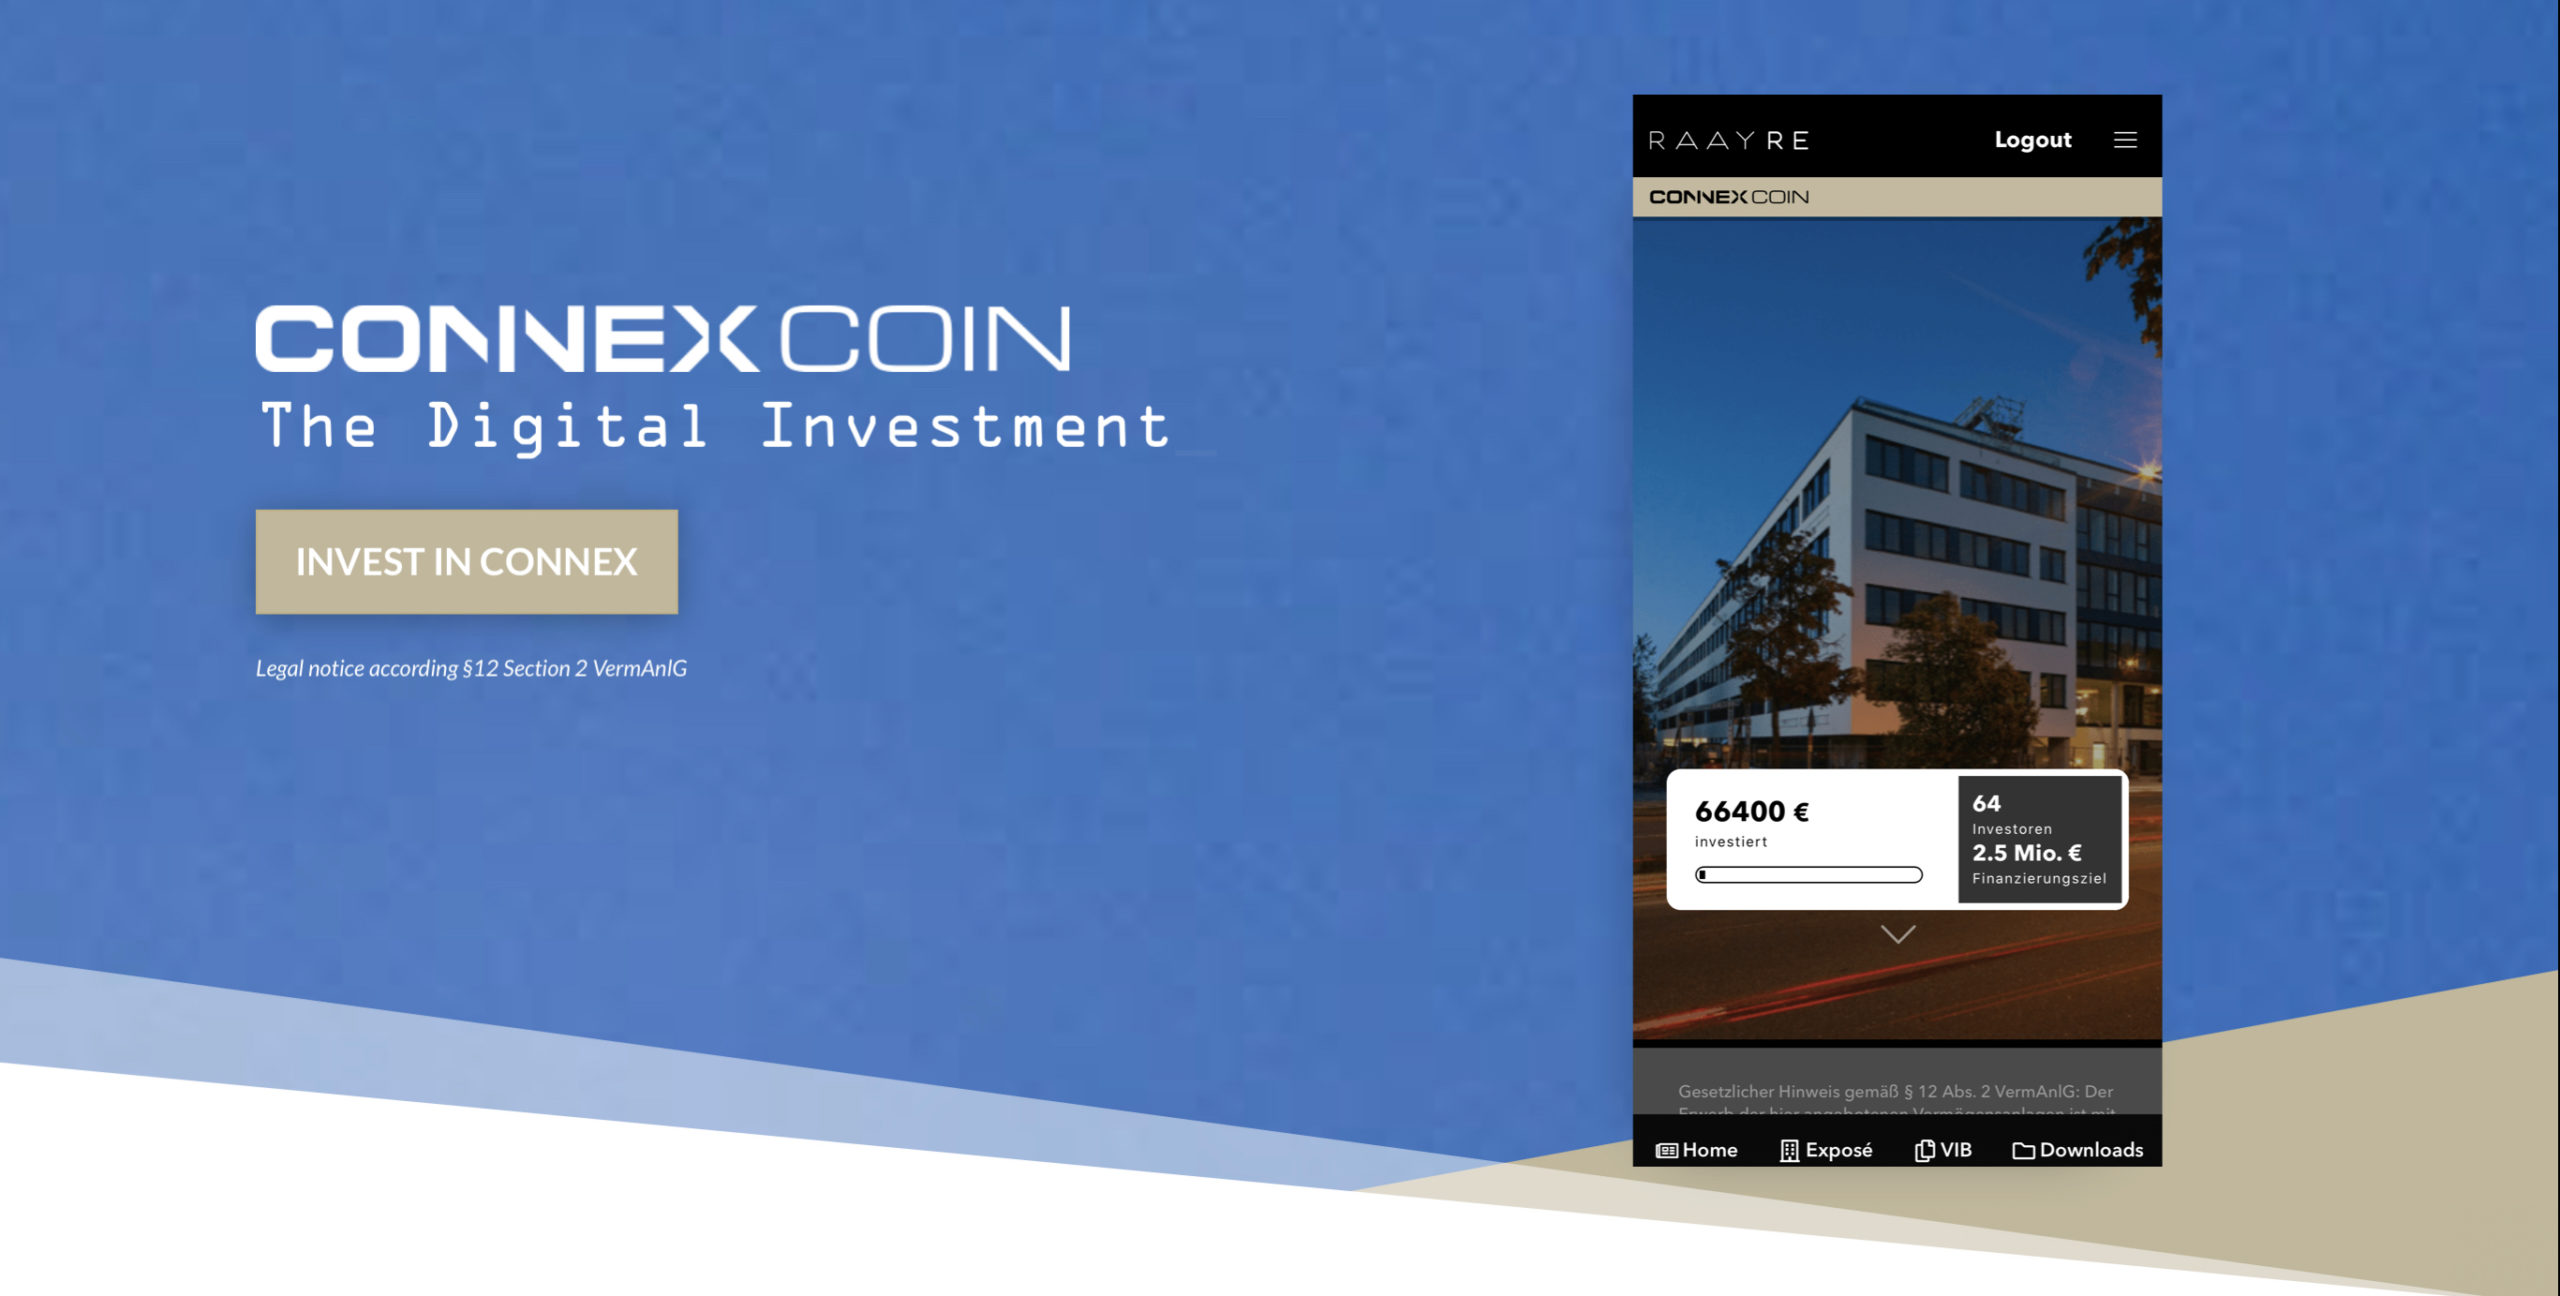 Connex Coin Token Sale - Week 1 Investment Recap